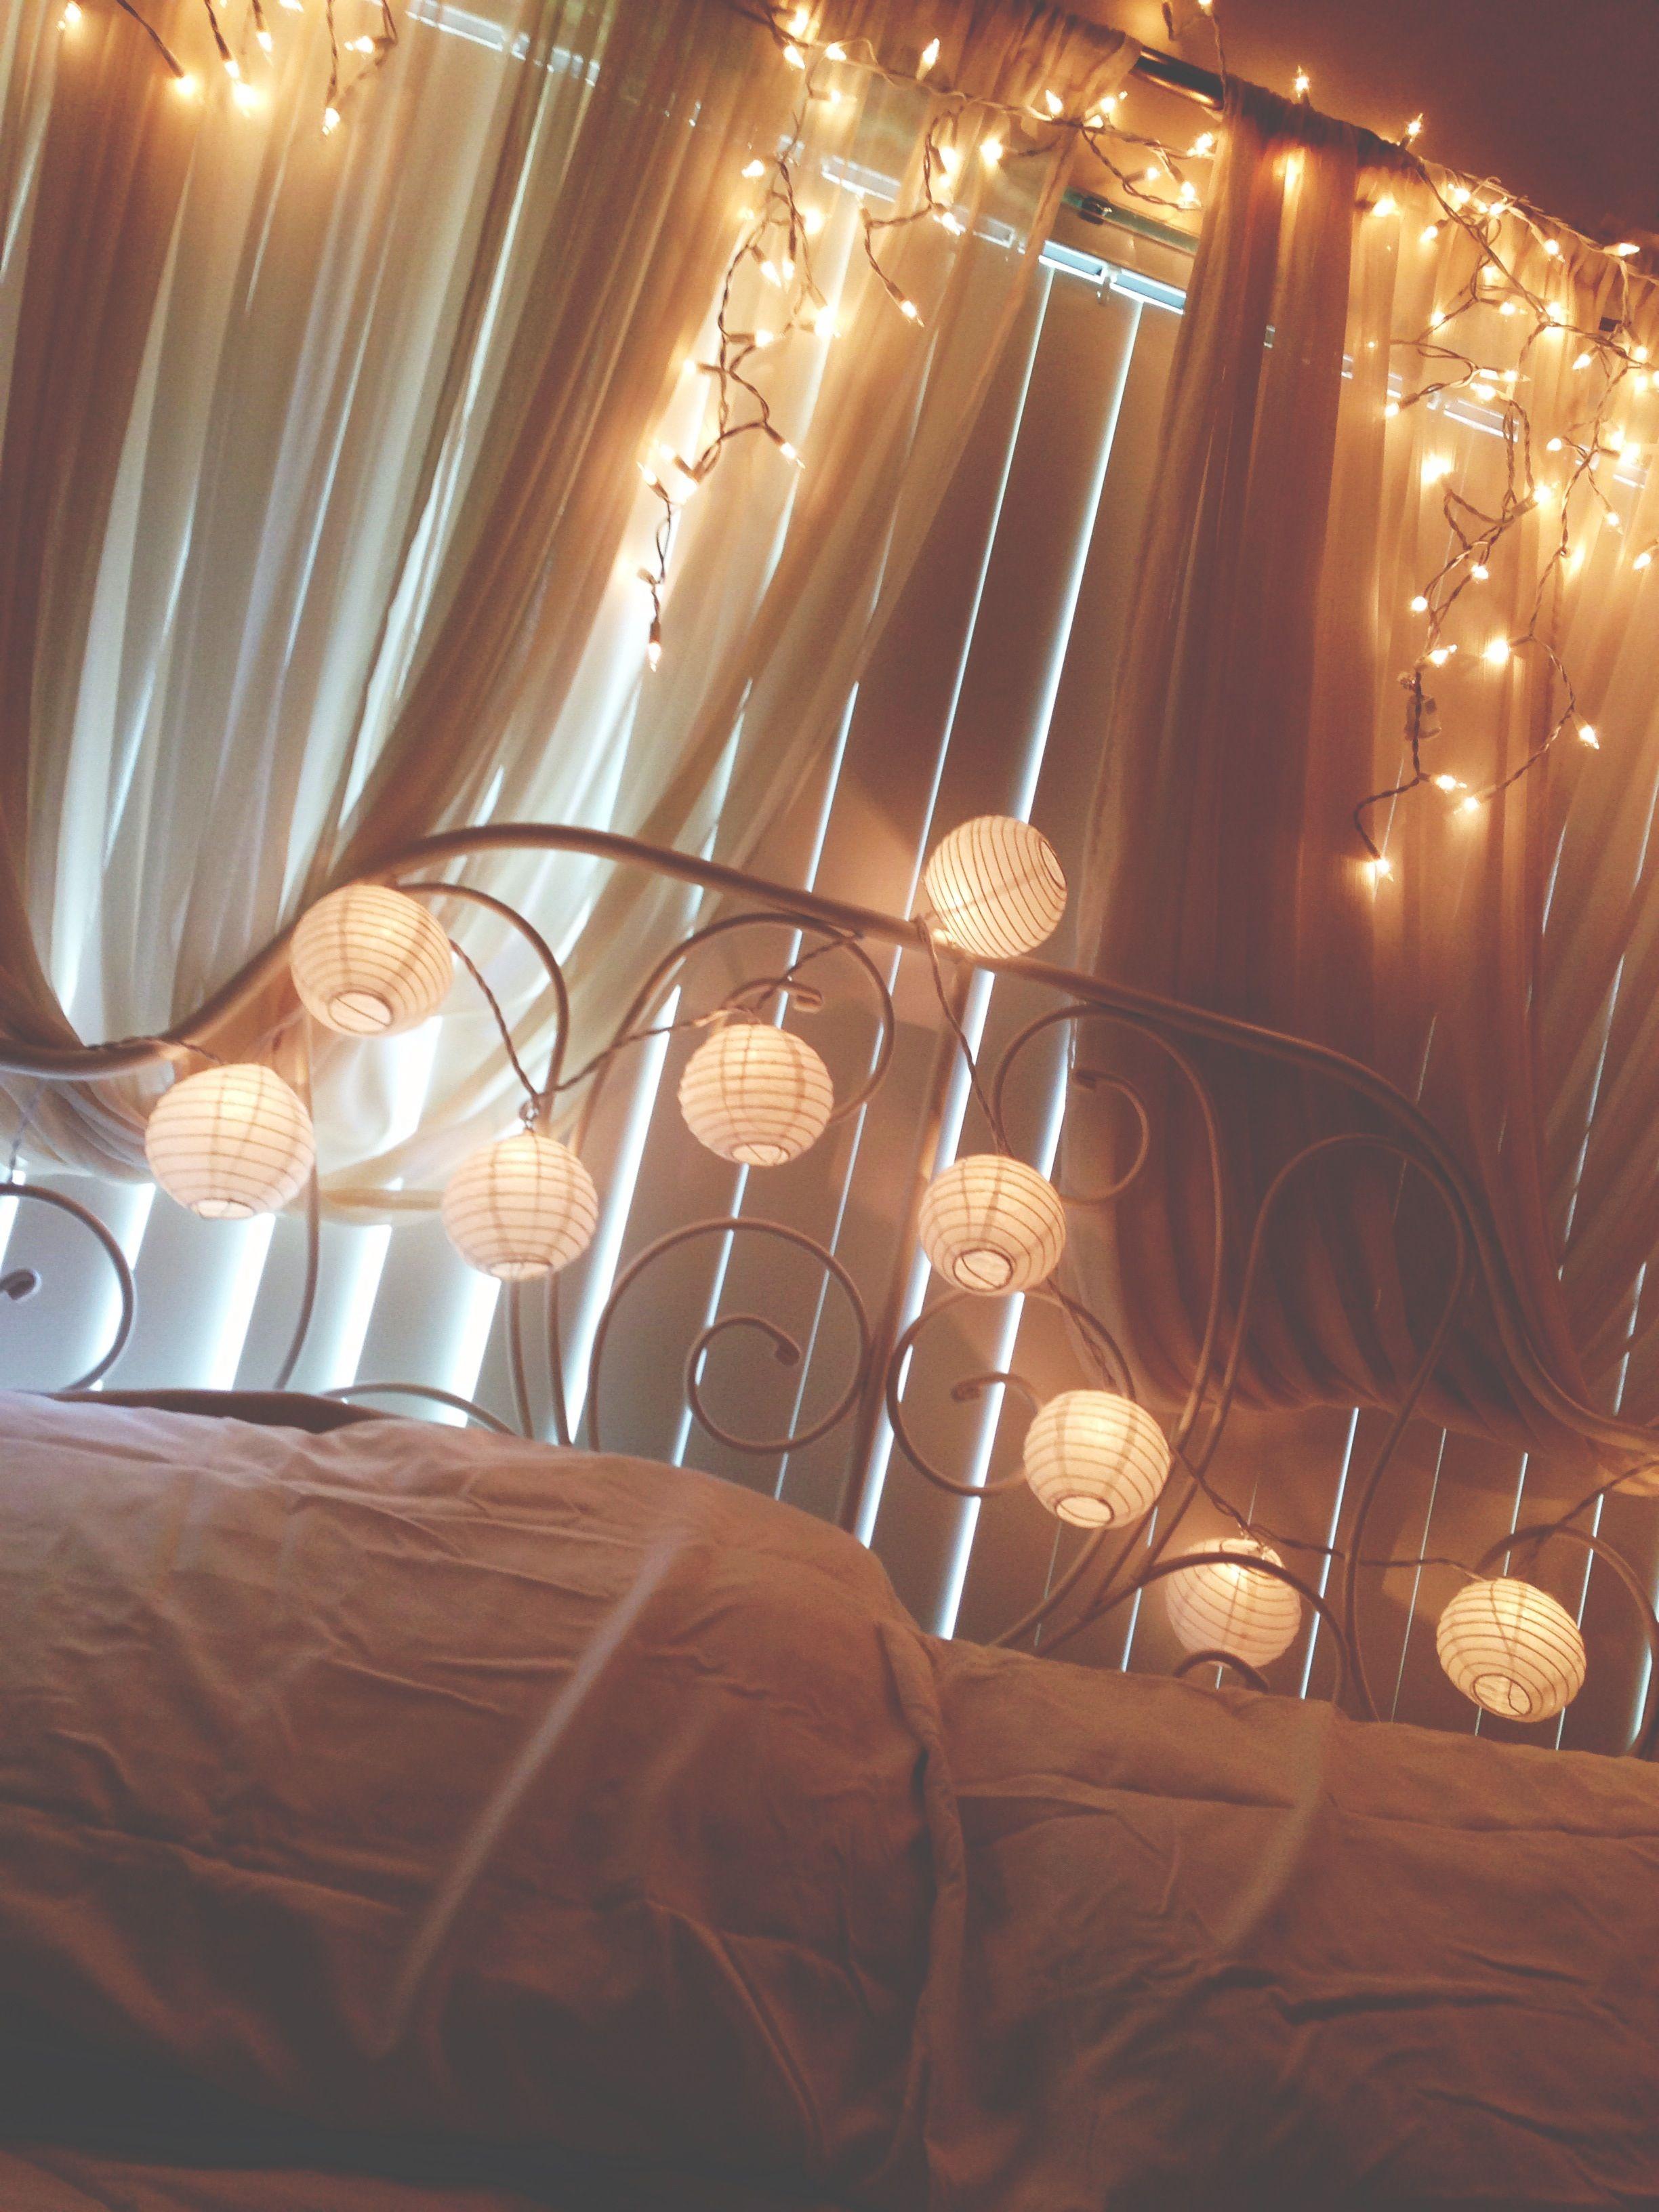 target led lights trend blue light and christmas pic pict of popular inspiring for icicle lighting bedroom aflk